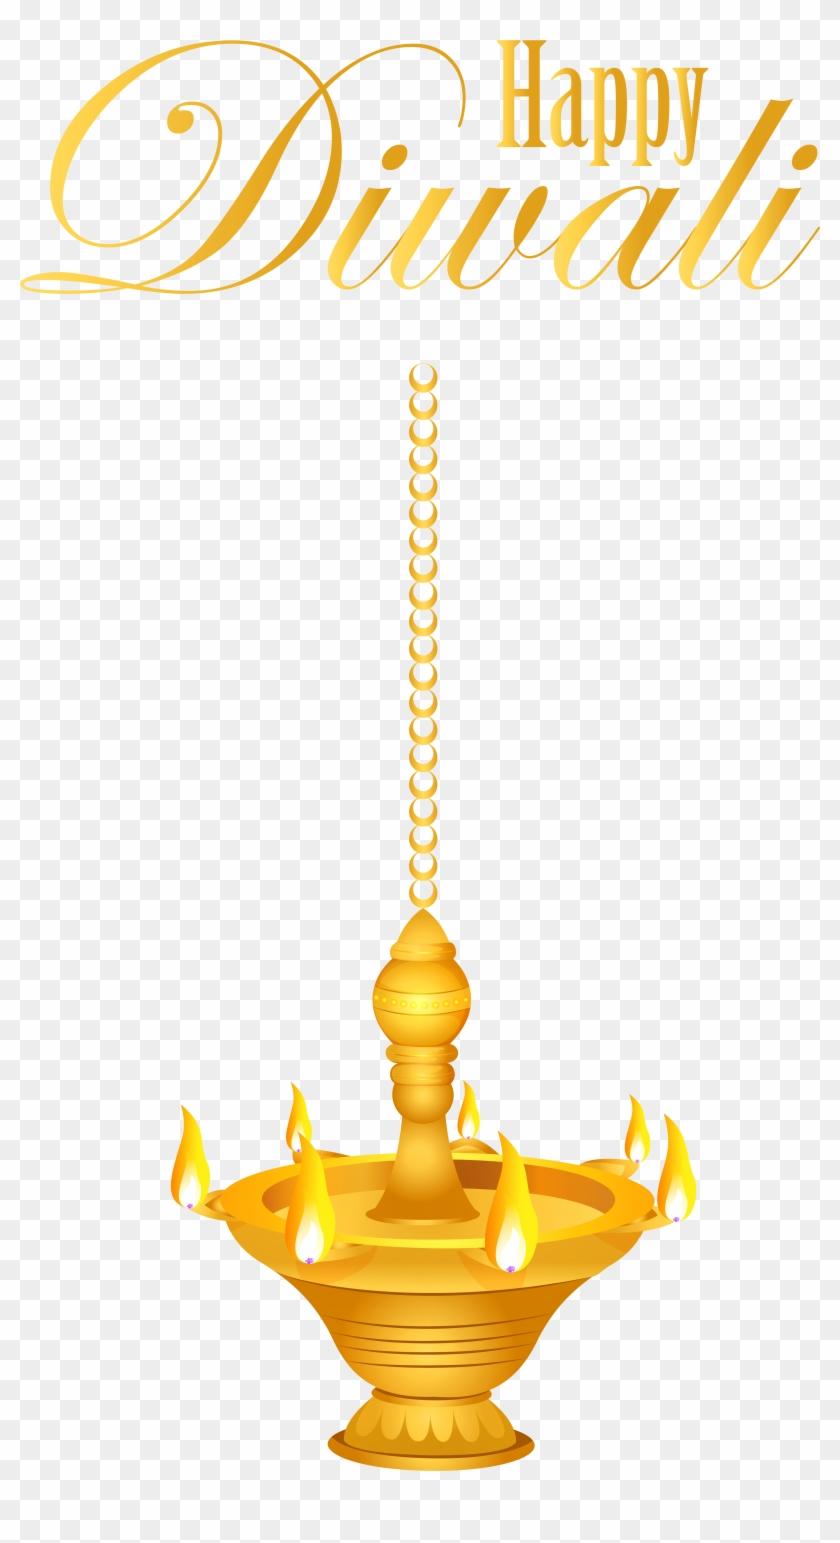 Happy Diwali Hanging Candlestick Png Clip Art Image.